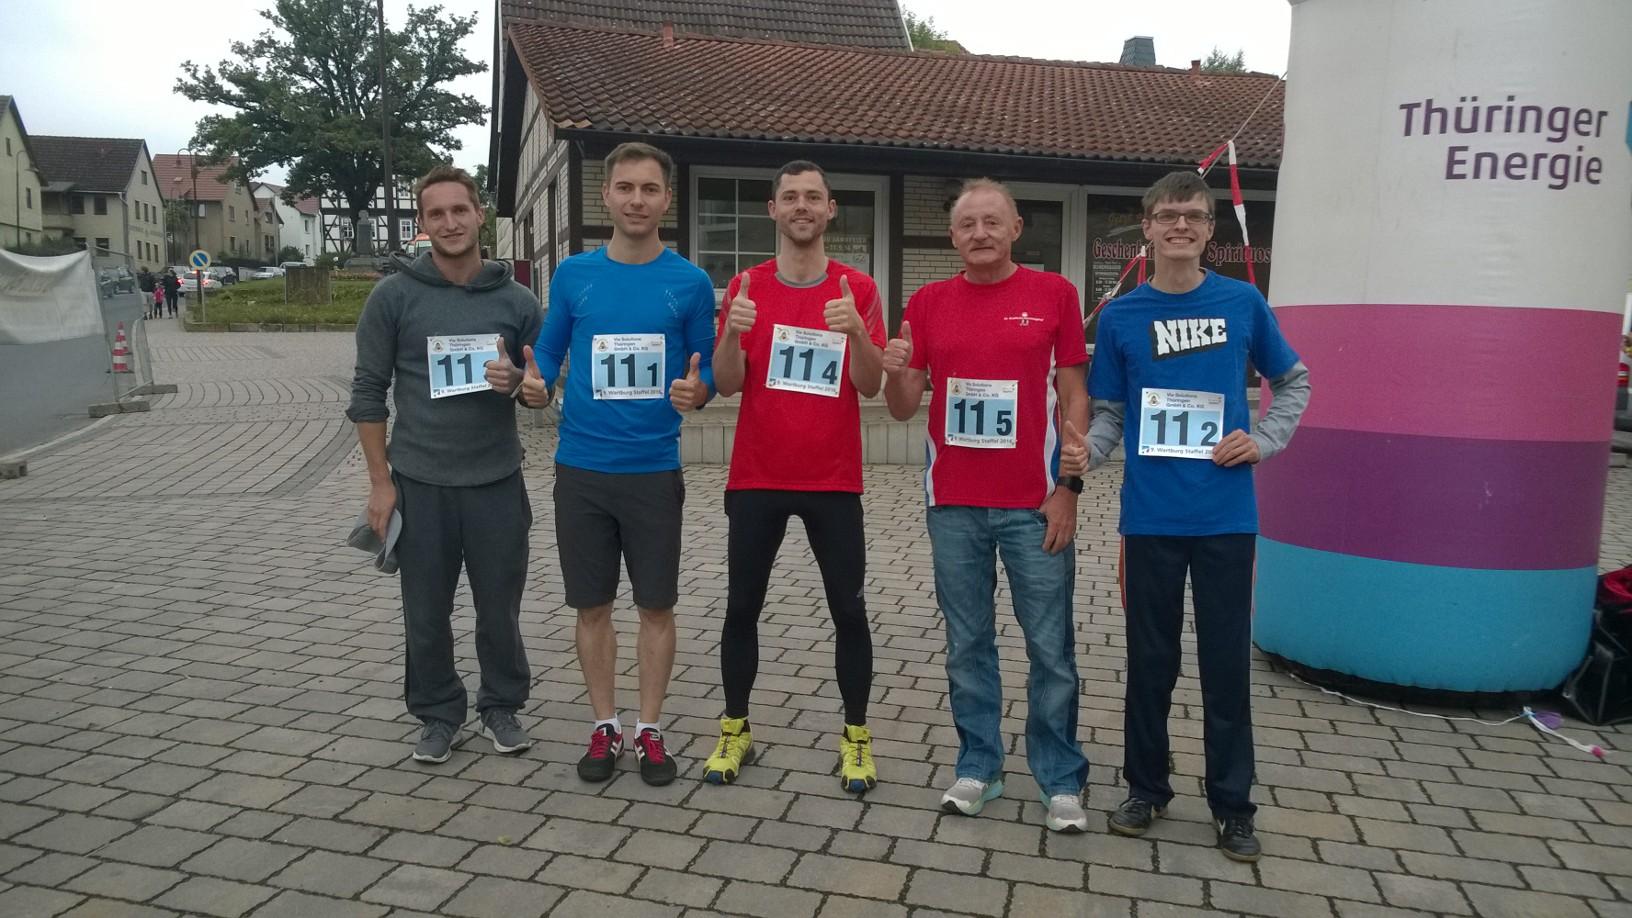 Team SPD Wartburgkreis/Eisenach (v.l.: Max Müller, Maik Klotzbach, Michael Klostermann, Hans-Joachim Ziegler, Martin Geißler)